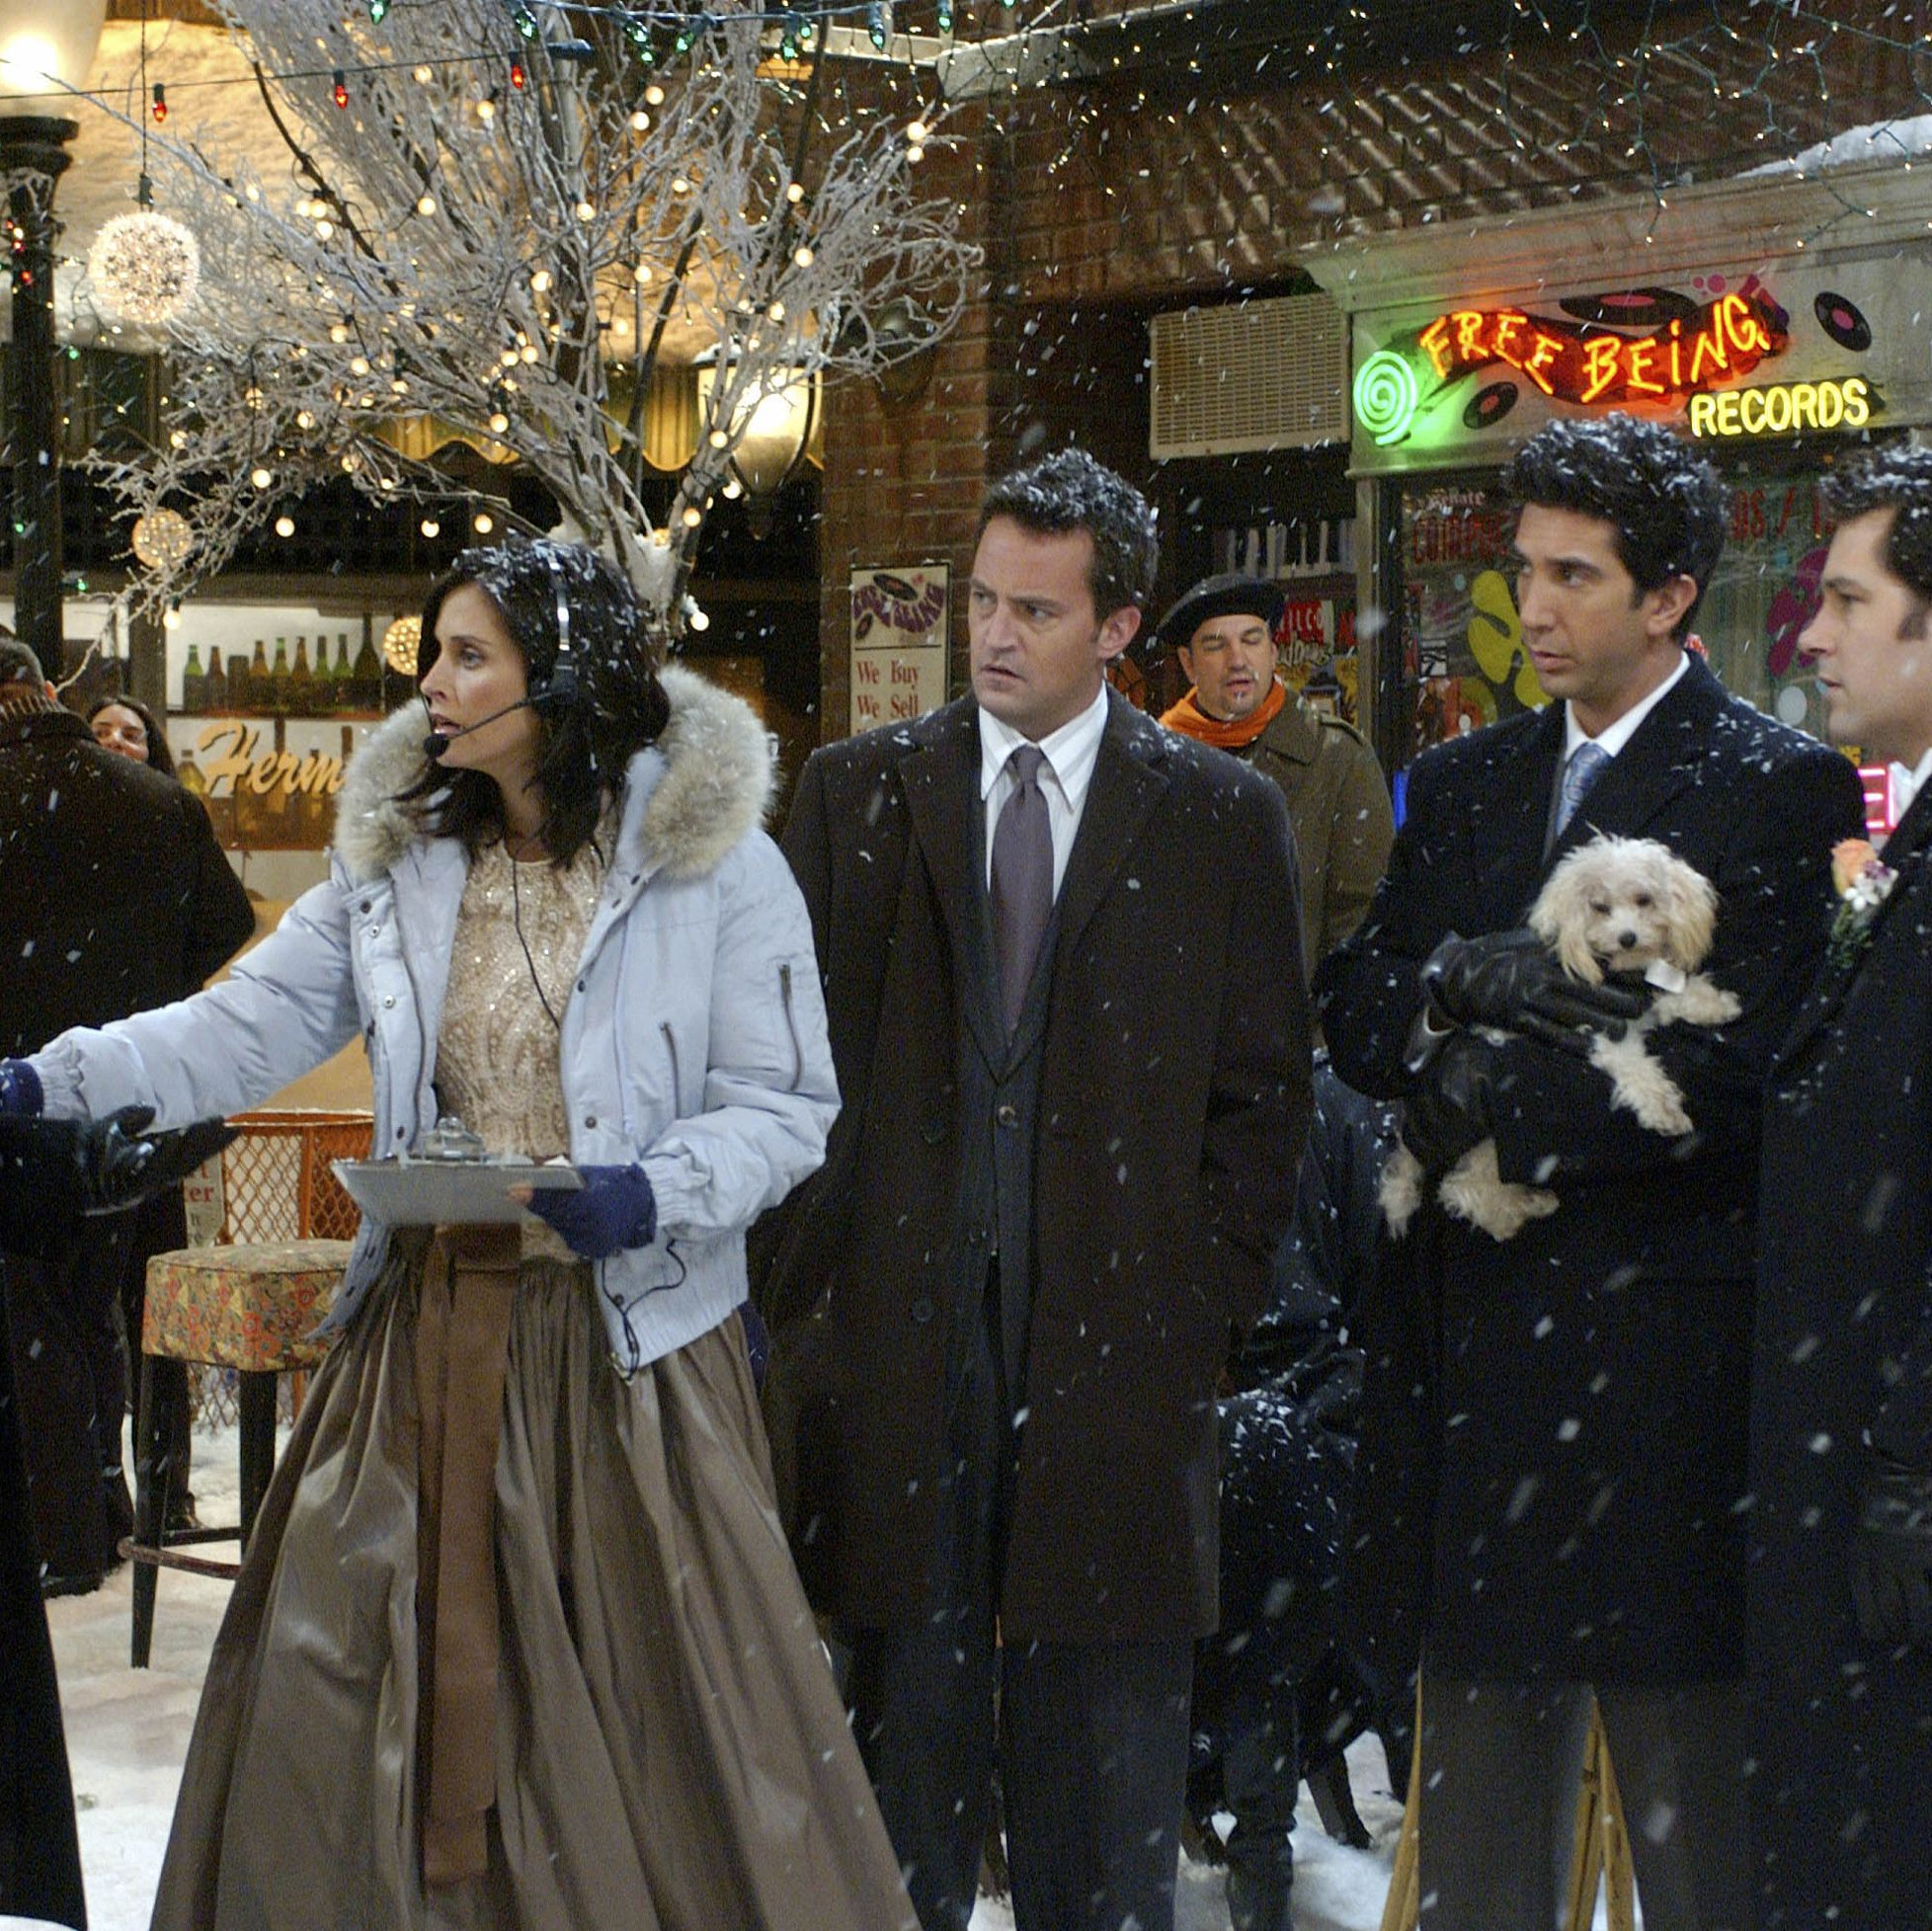 FRIENDS -- NBC Series -- &quot&#x3B;The One With Phoebe&#39&#x3B;s Wedding&quot&#x3B; -- Pictured: (l-r) Matt LeBlanc as Joey Tribbiani, Courteney Cox as Monica Geller-Bing, Matthew Perry as Chandler Bing, David Schwimmer as Dr. Ross Geller, Paul Rudd as Mike Hannigan -- Photo by: NBCU Photo Bank